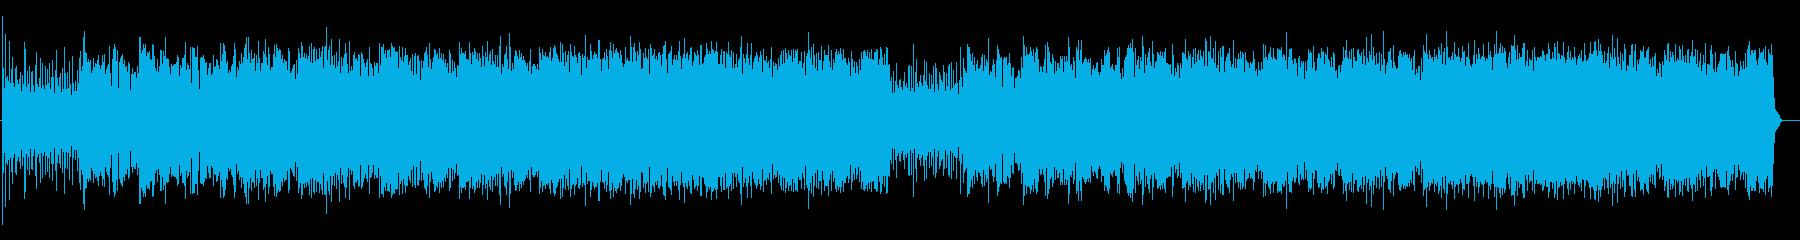 Retro, sprinting, cool, bad's reproduced waveform